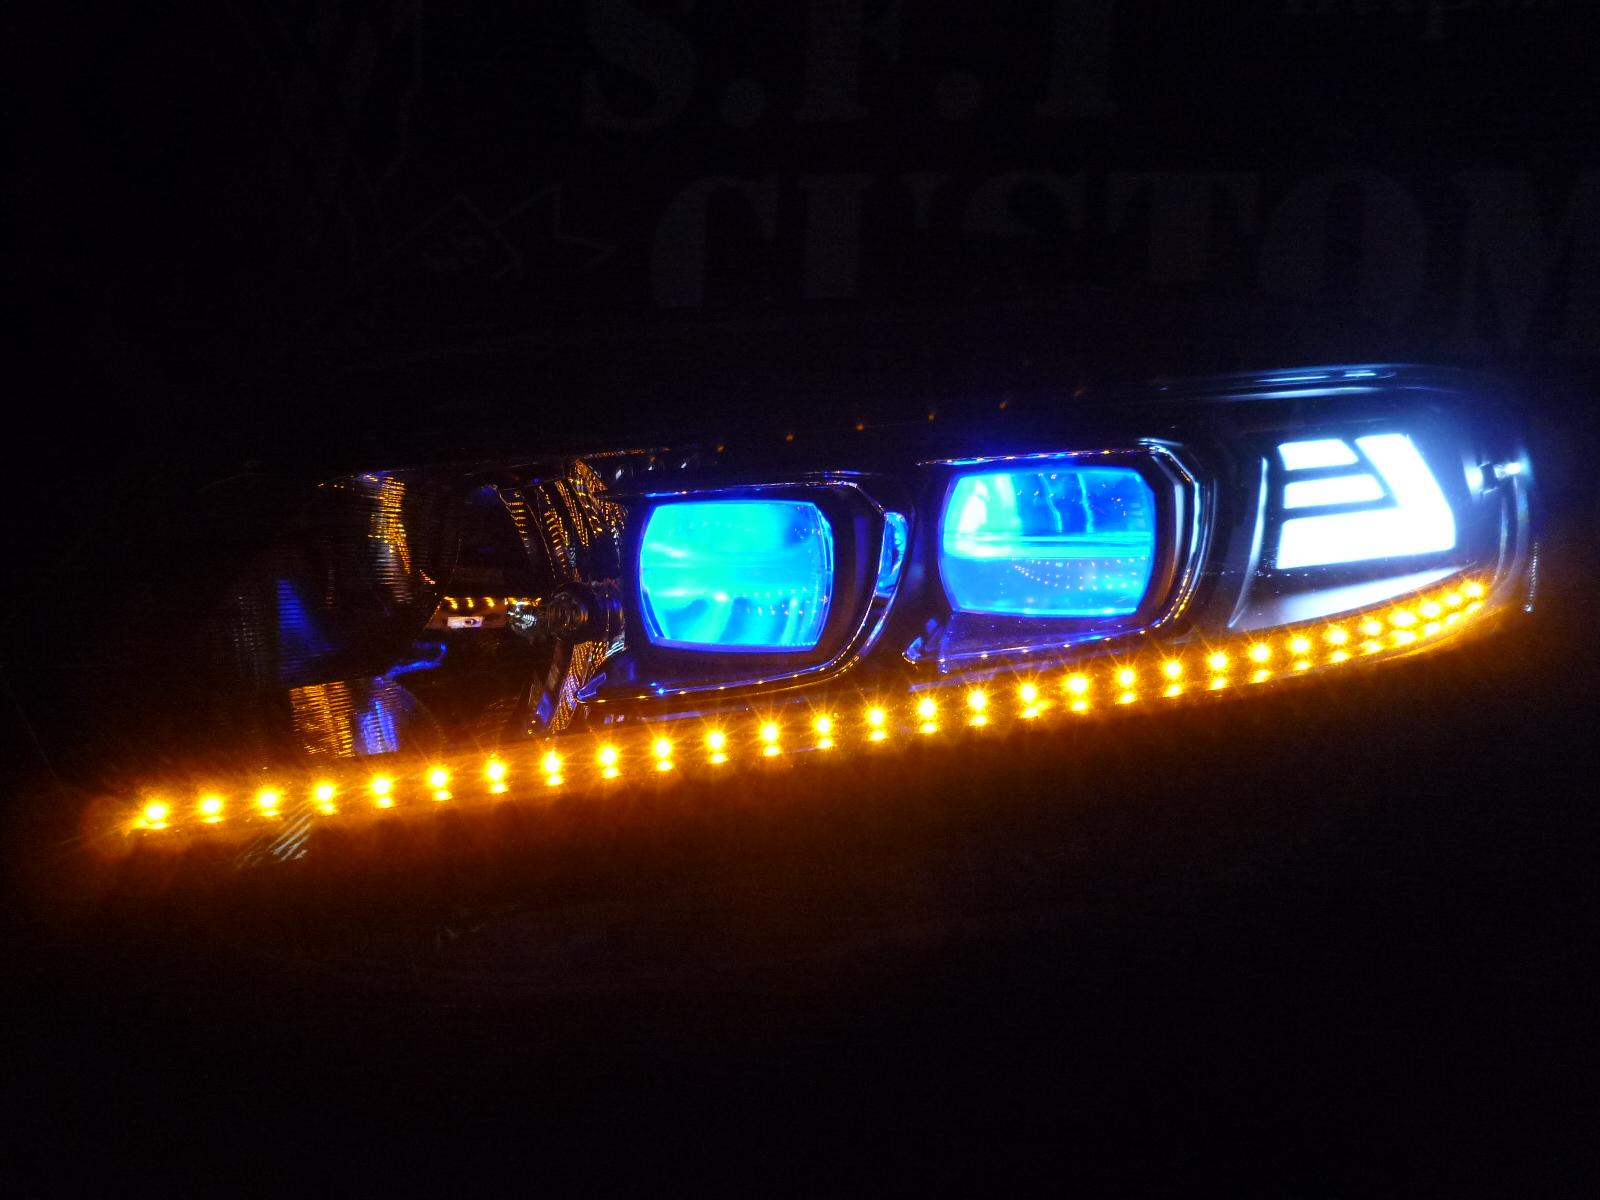 S660 ヘッドライト加工